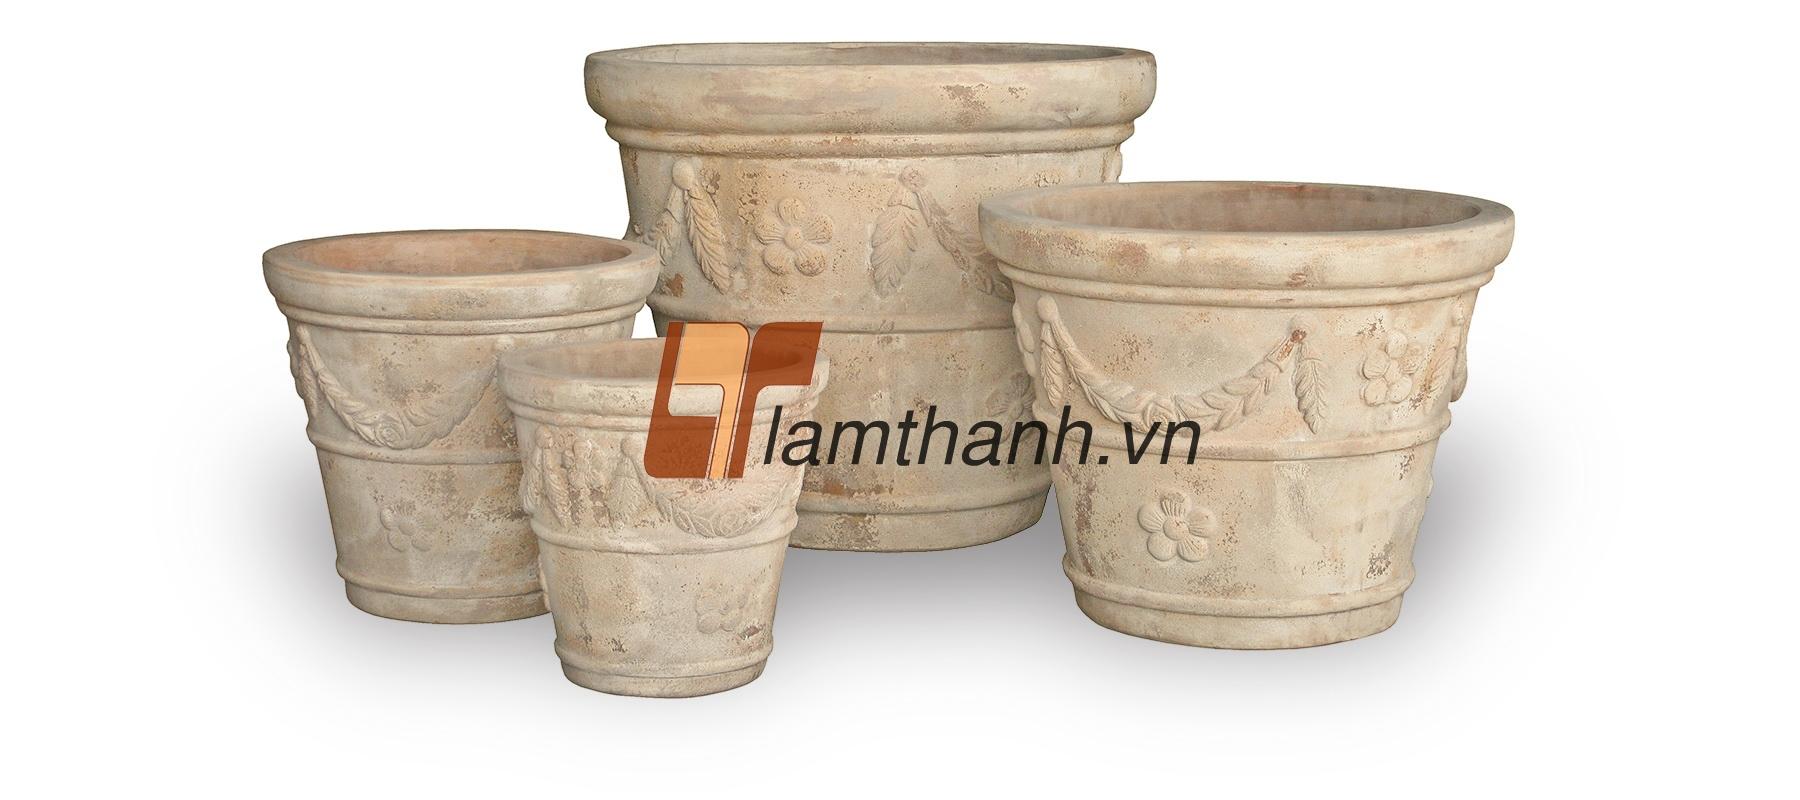 vietnam terracotta, pottery 07